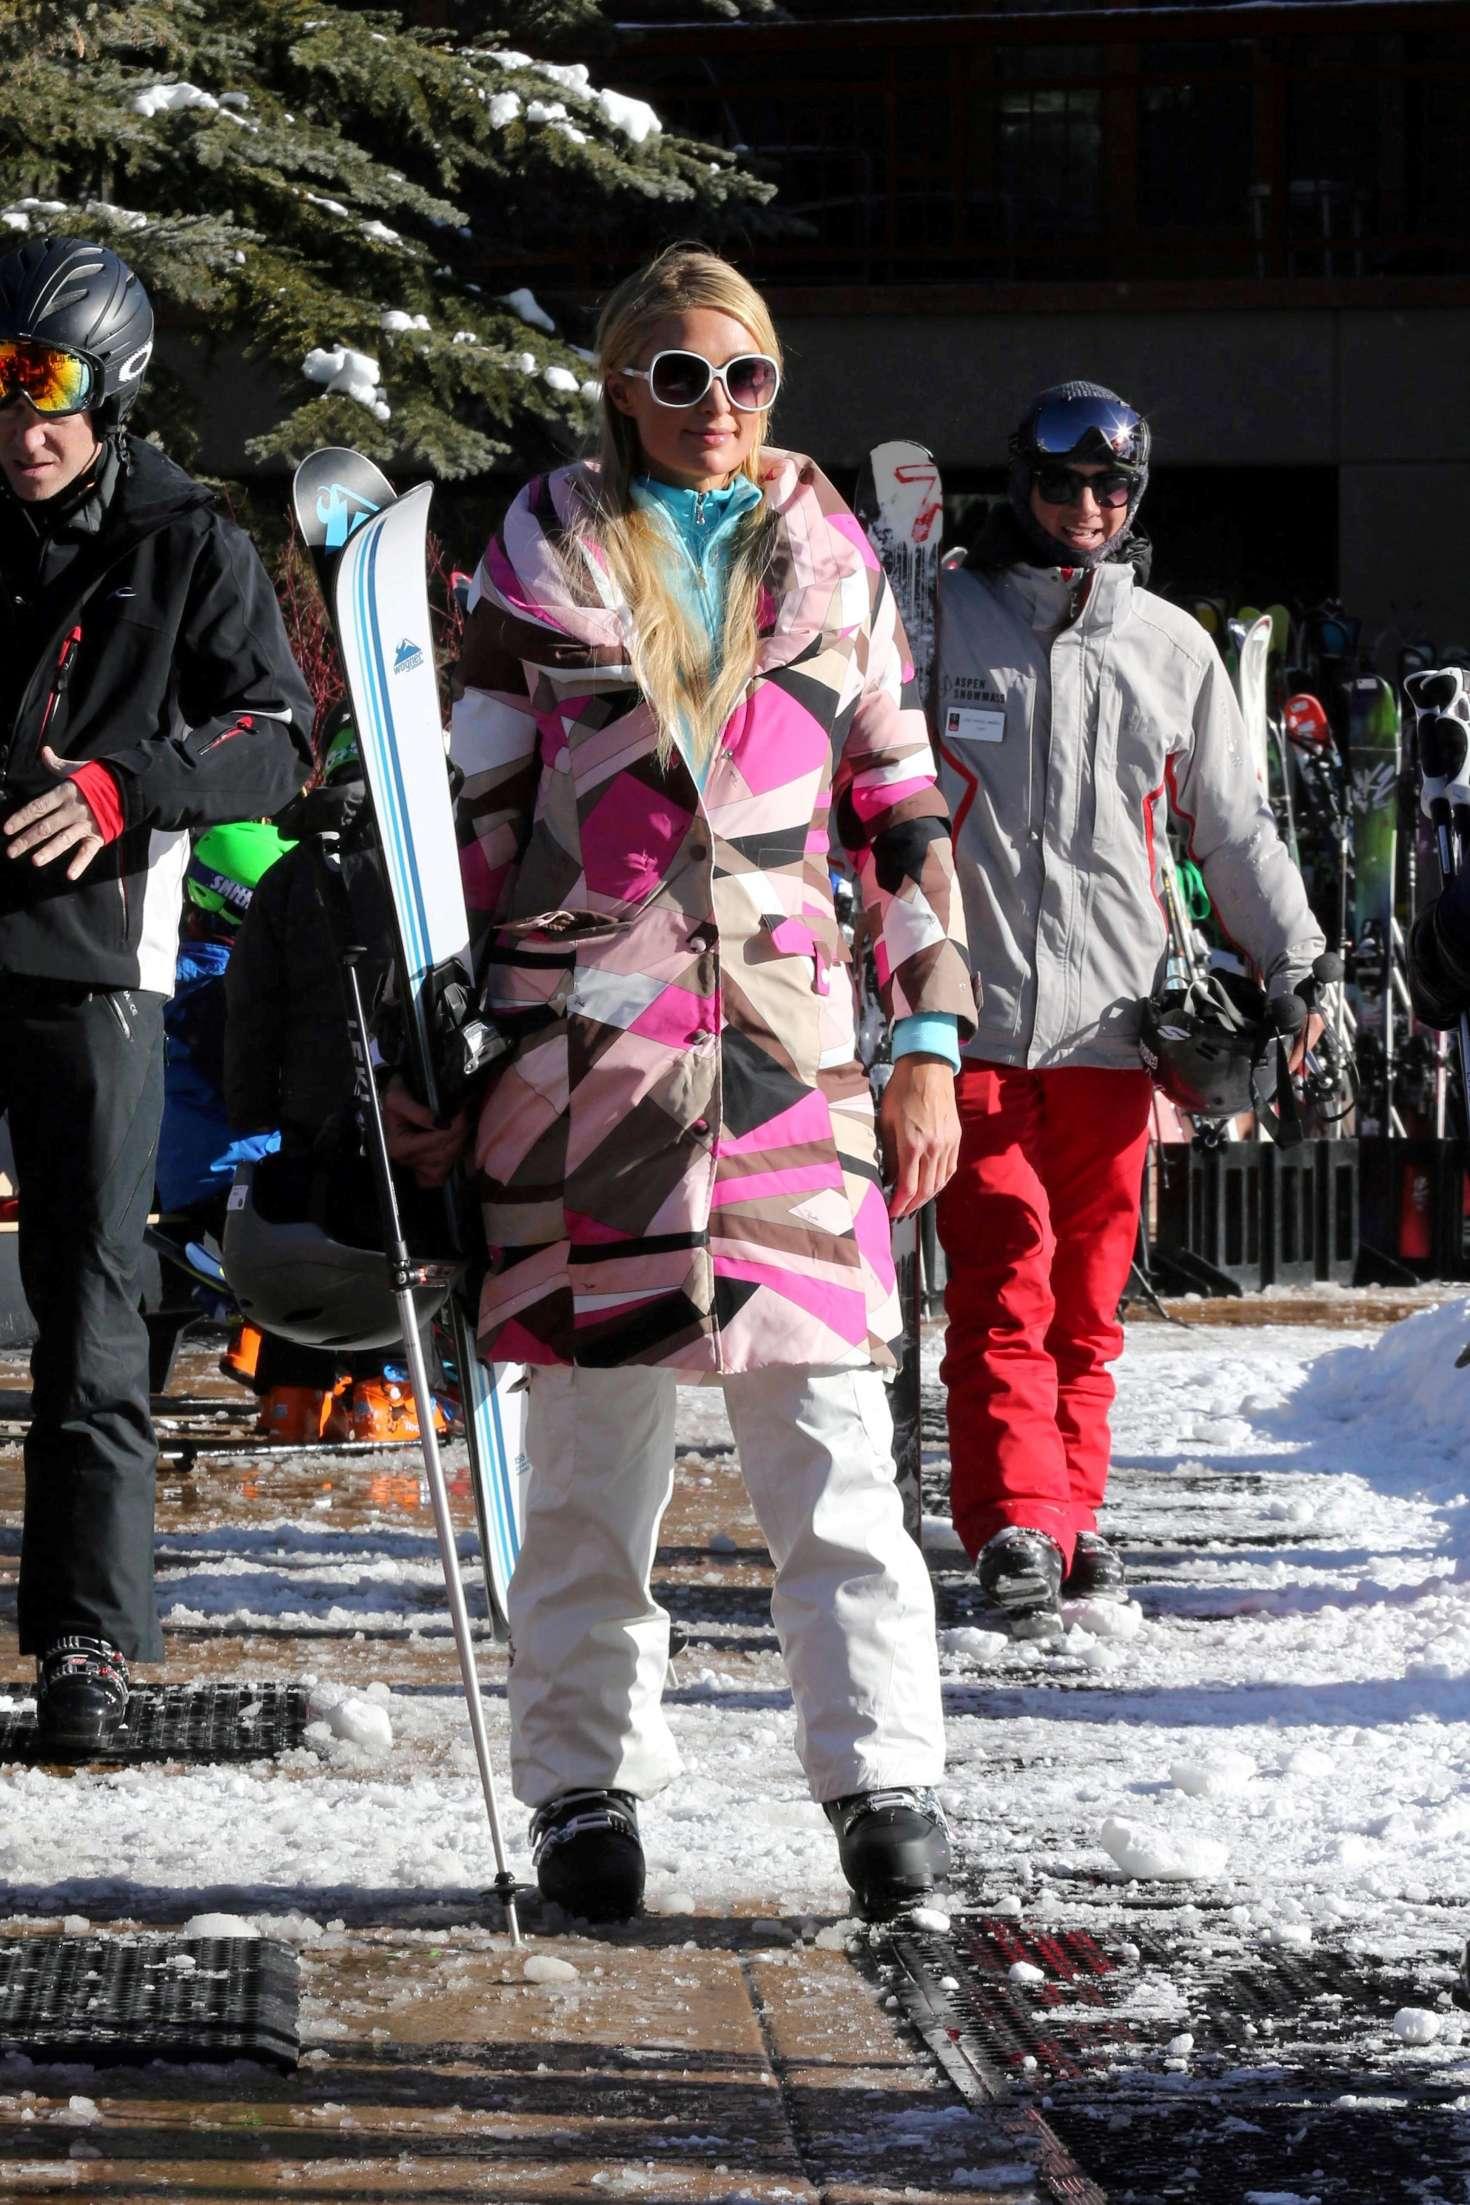 Paris Hilton 2016 : Paris Hilton Skiing in Aspen -19